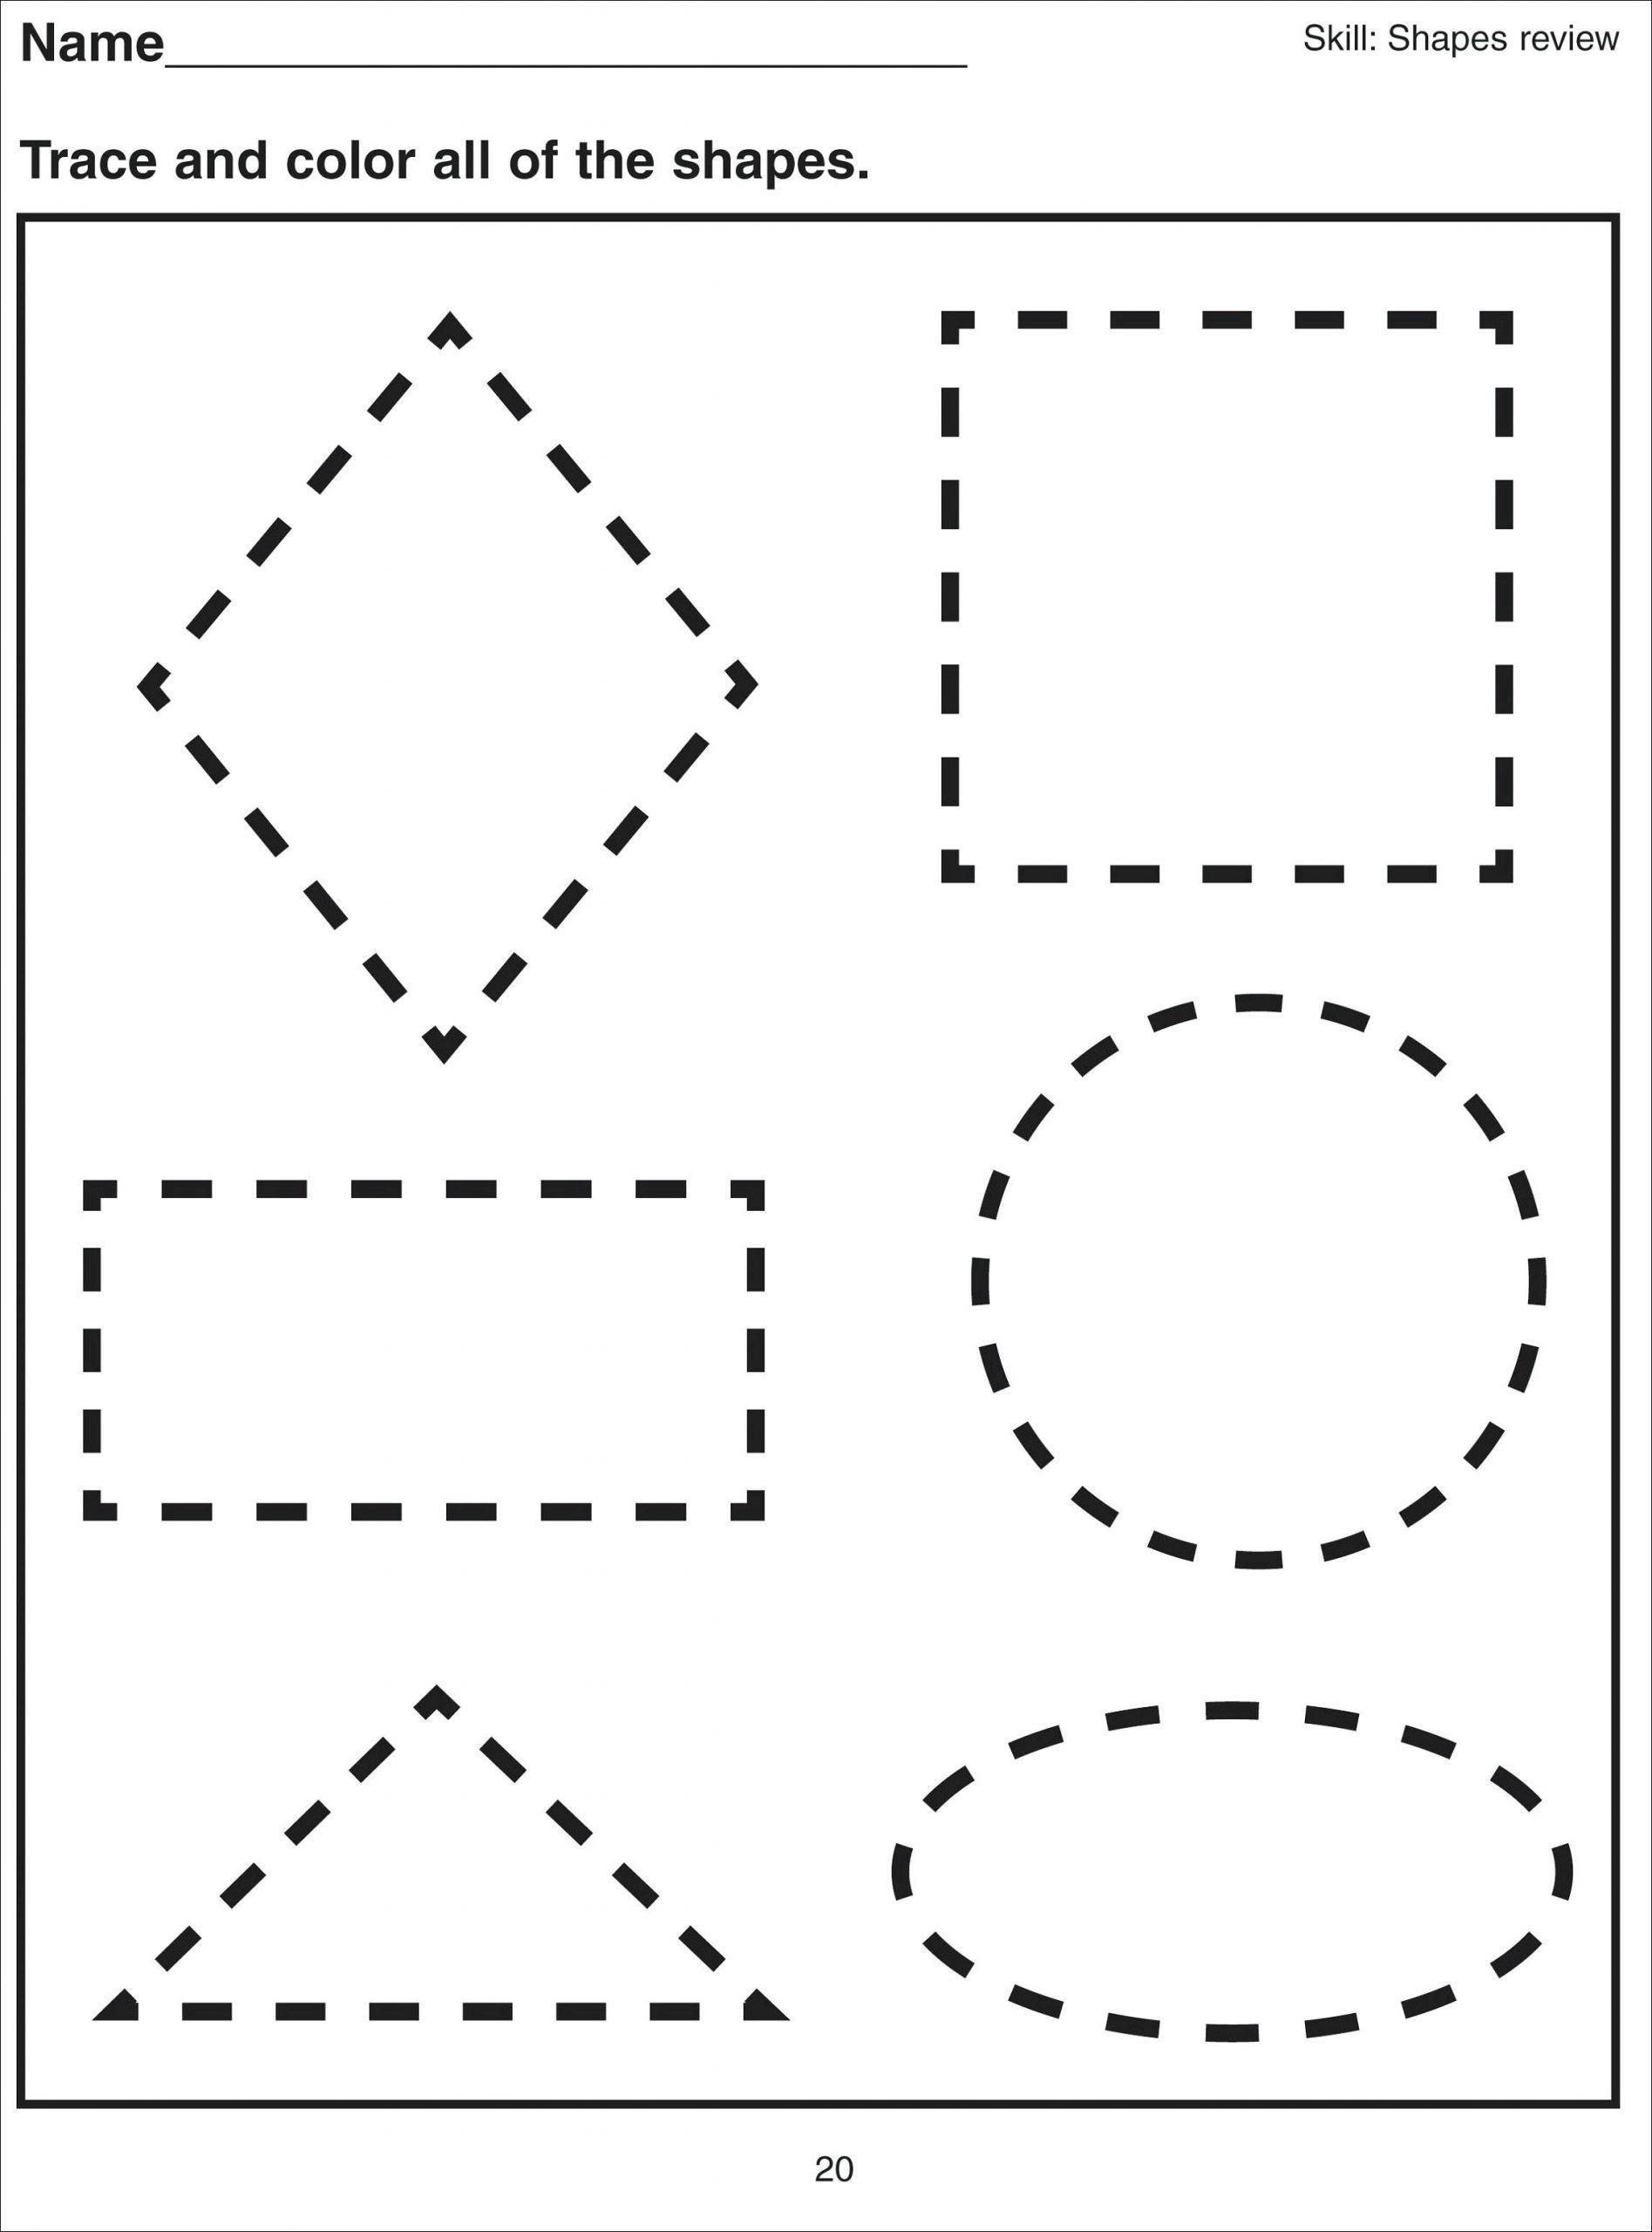 4 New Printable Vocabulary Worksheets Worksheet Printable Basic Shapes Workshe Shapes Worksheet Kindergarten Free Preschool Worksheets Shape Tracing Worksheets